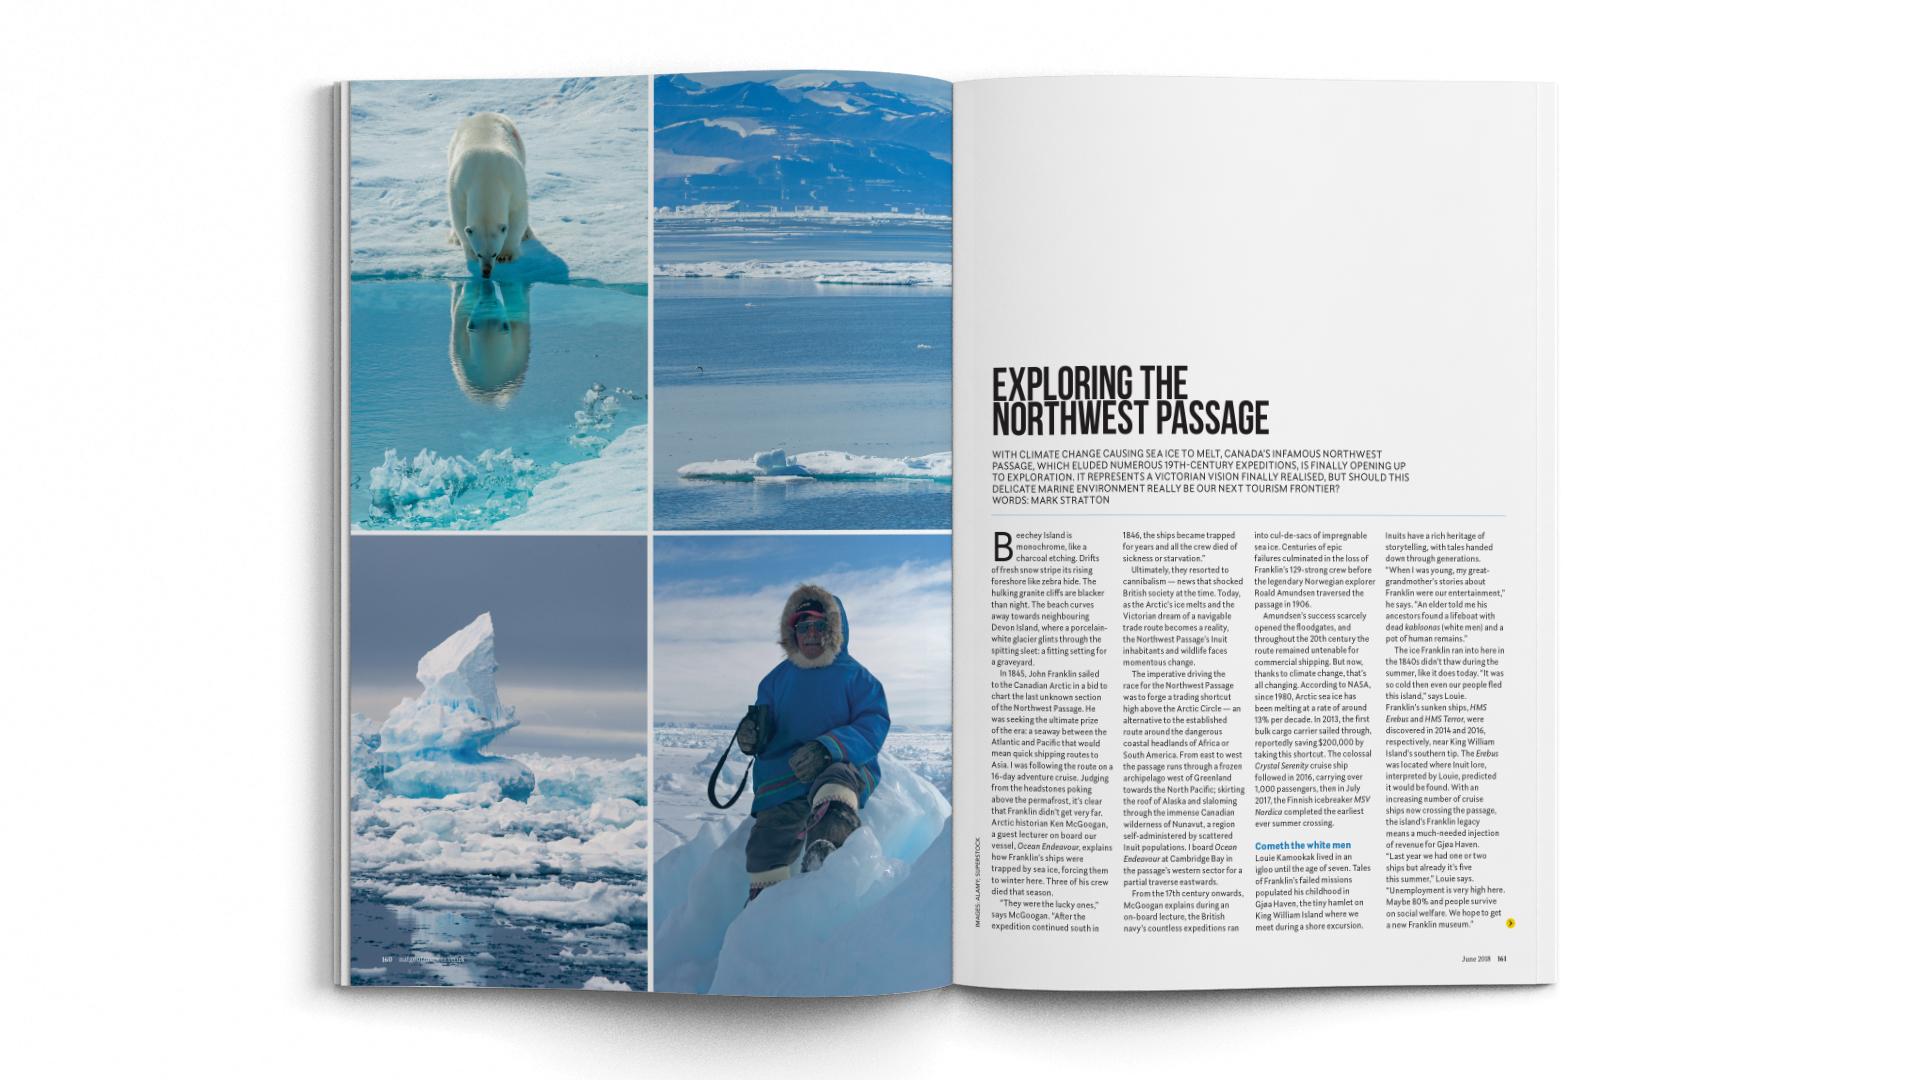 A4-Magazine-DPS-NGT-TT-Report-Northwest-Passage-1